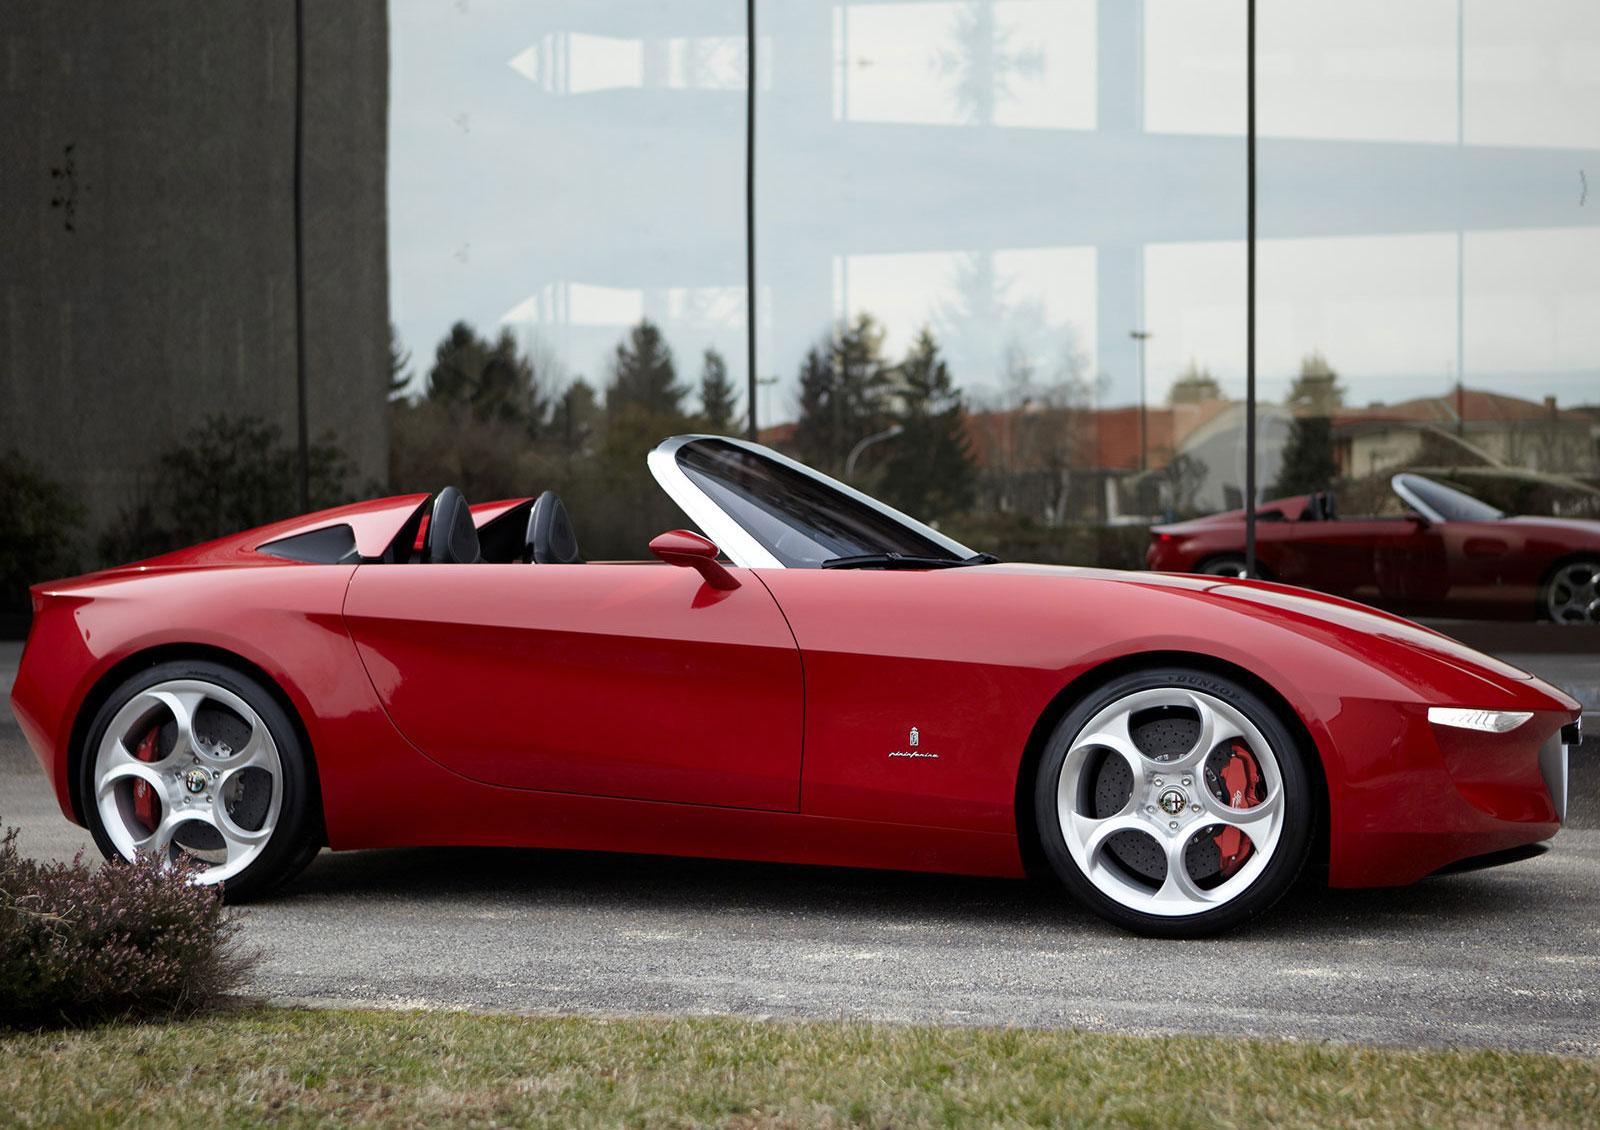 Alfa Romeo 2uettottanta - Teamspeed.com